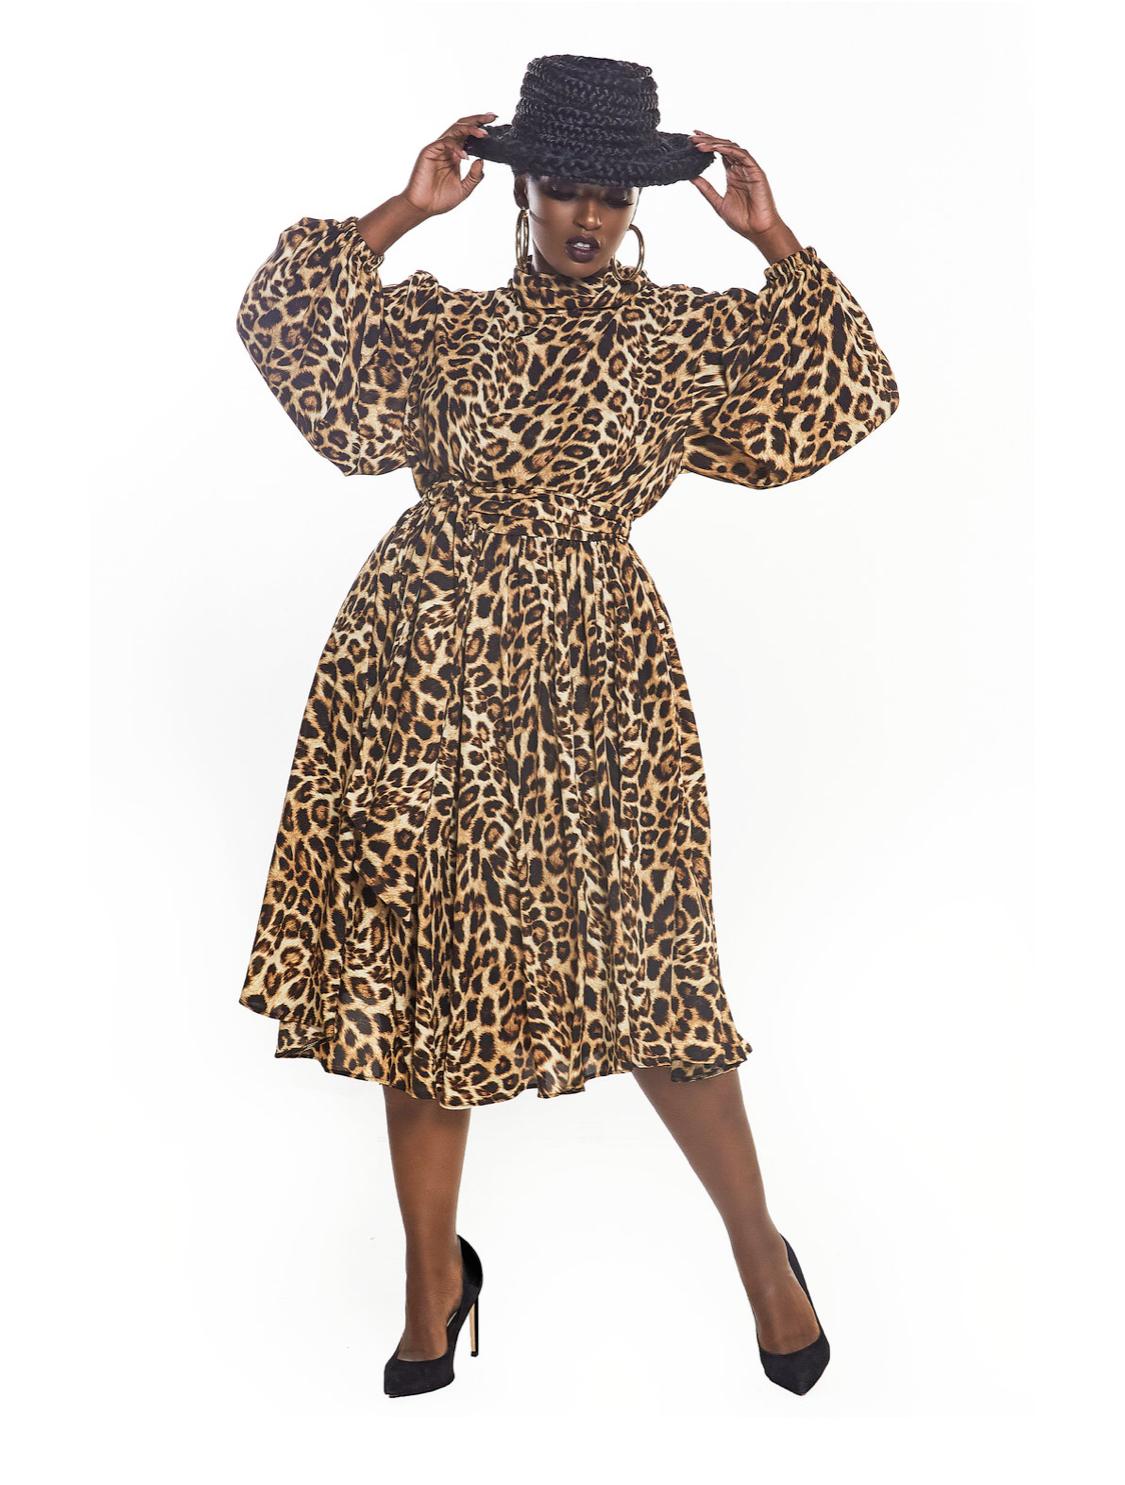 Jibri leopard high-neck flare dress, $250